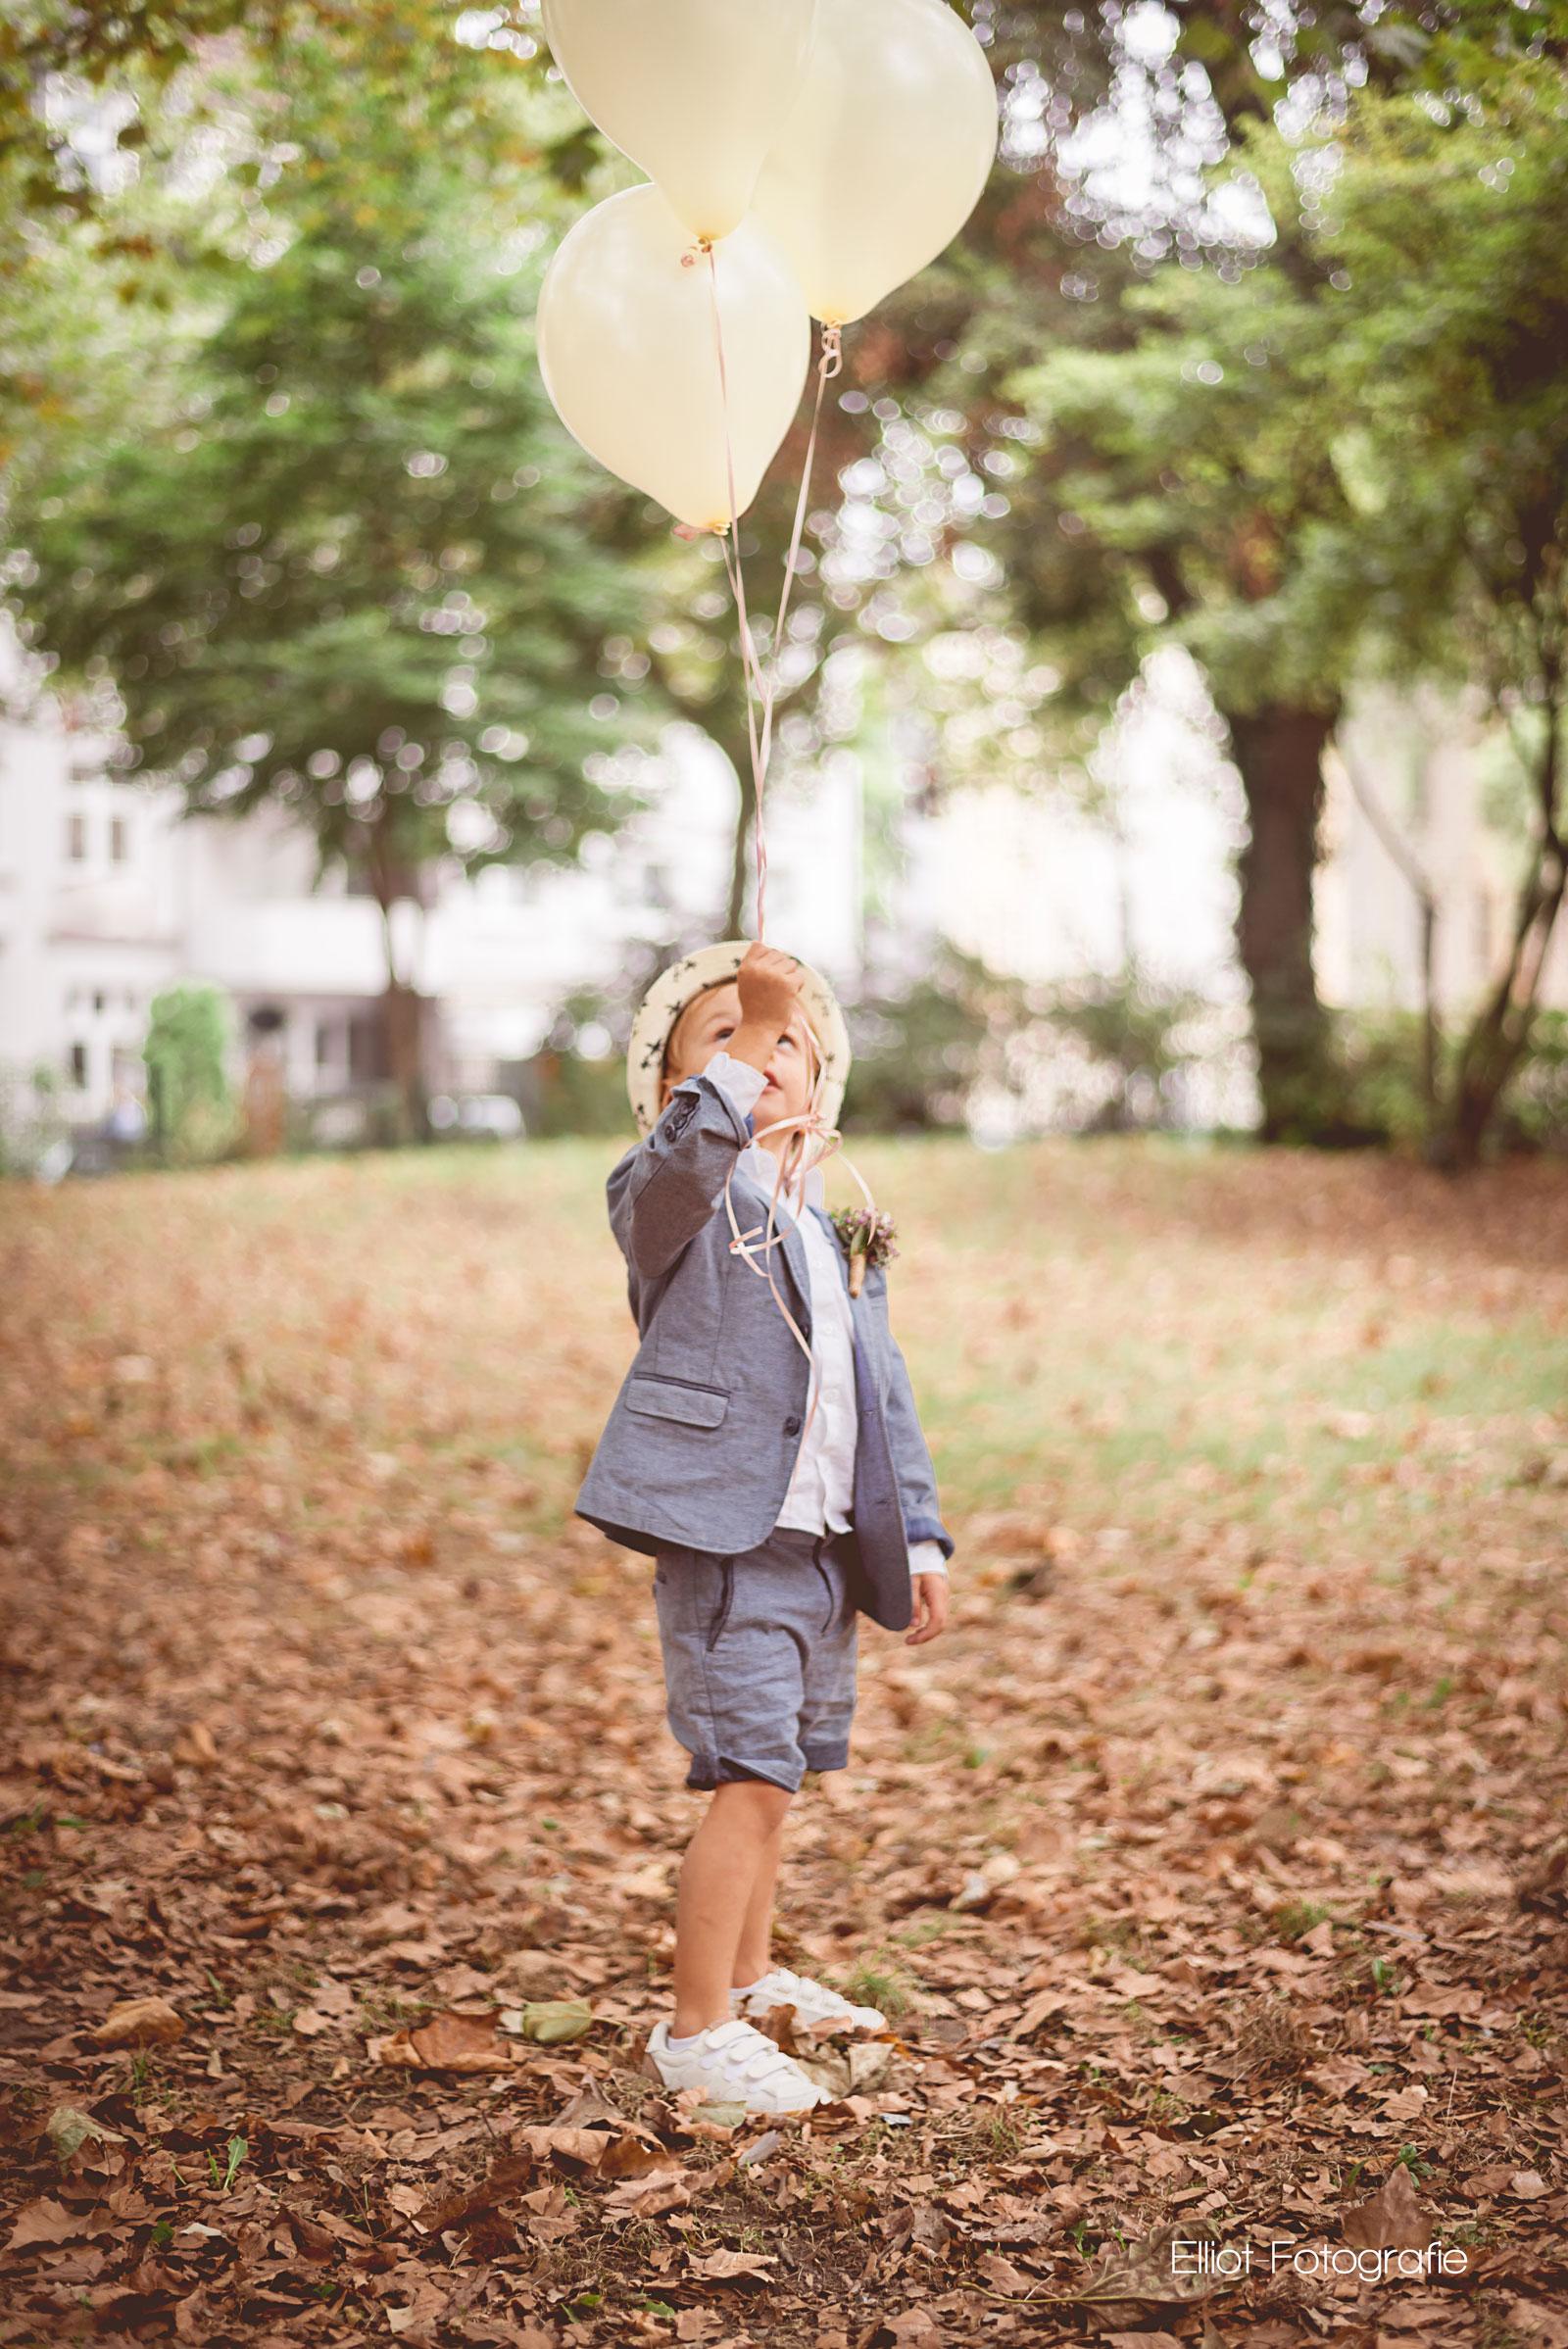 Babyfotografie-Blog-25-web